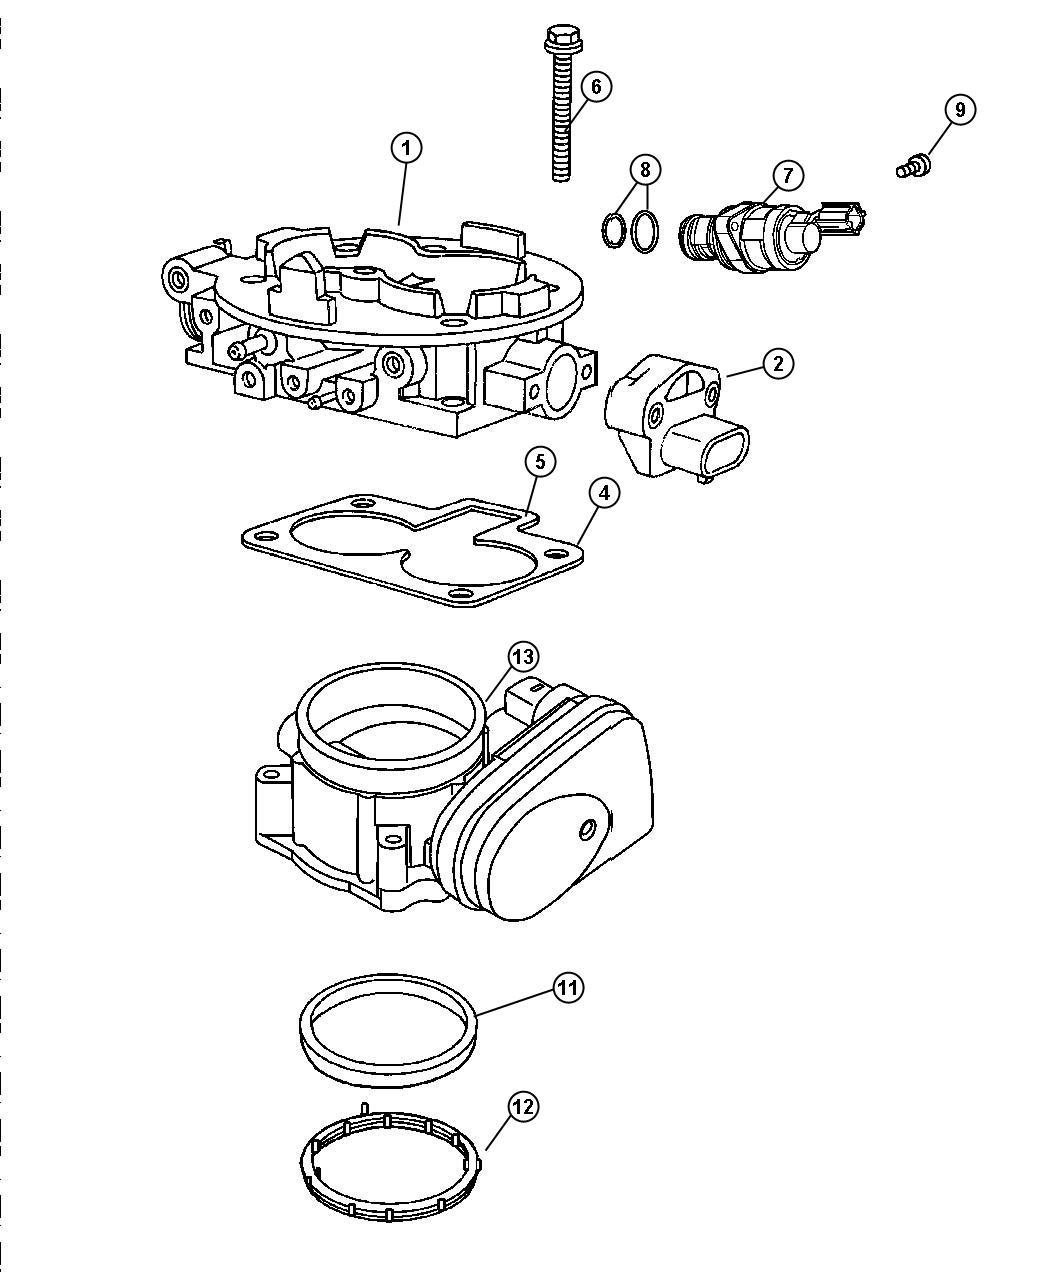 Dodge Durango Throttle body. Engine, hemi, gas